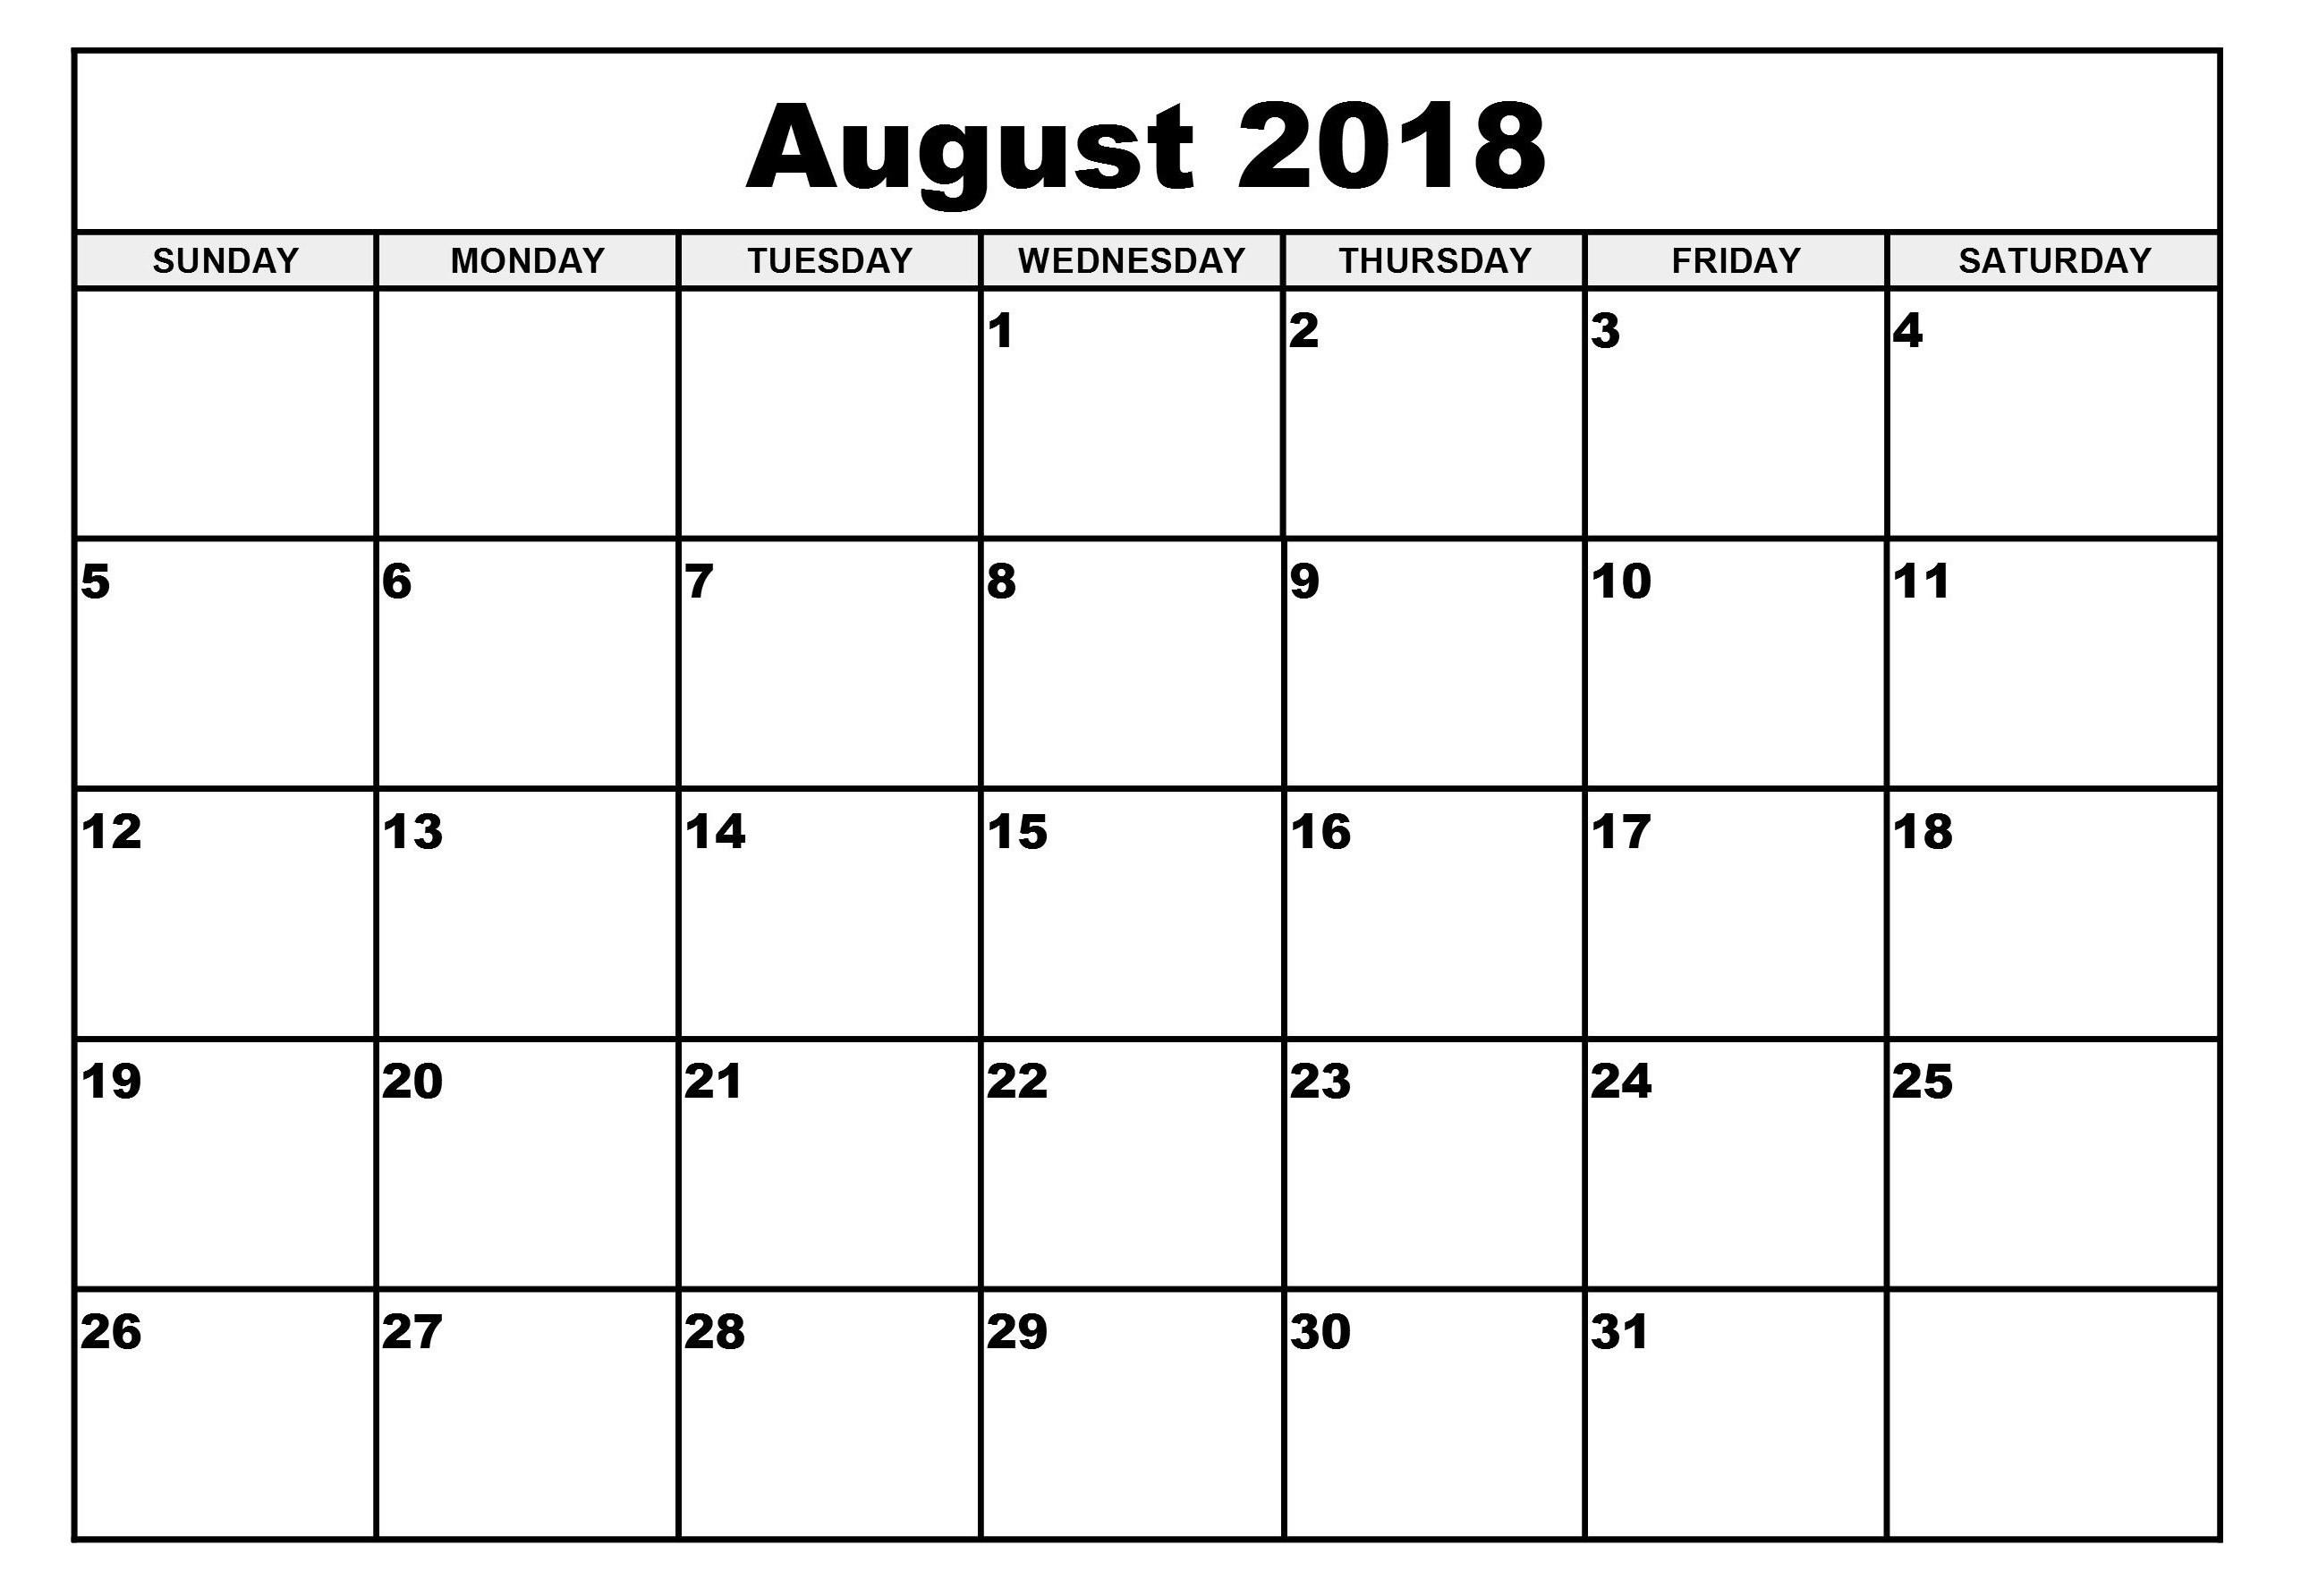 September 2018 Calendar Printable Wincalendar The Audi Car